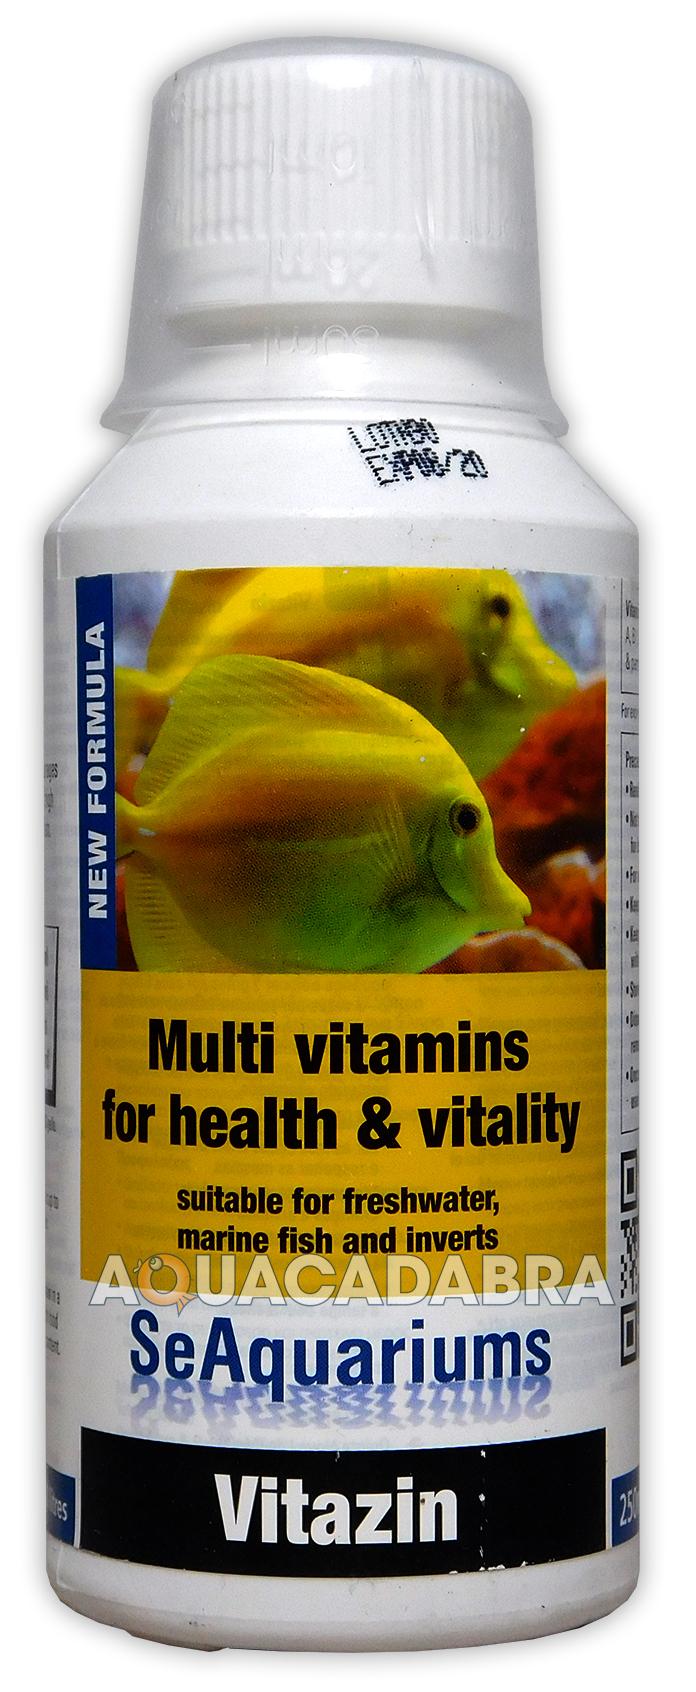 Freshwater aquarium fish vitamins - Water Life Vitazin 250ml Multi Vitamin Supplement Healthy Aquarium Fish Tank